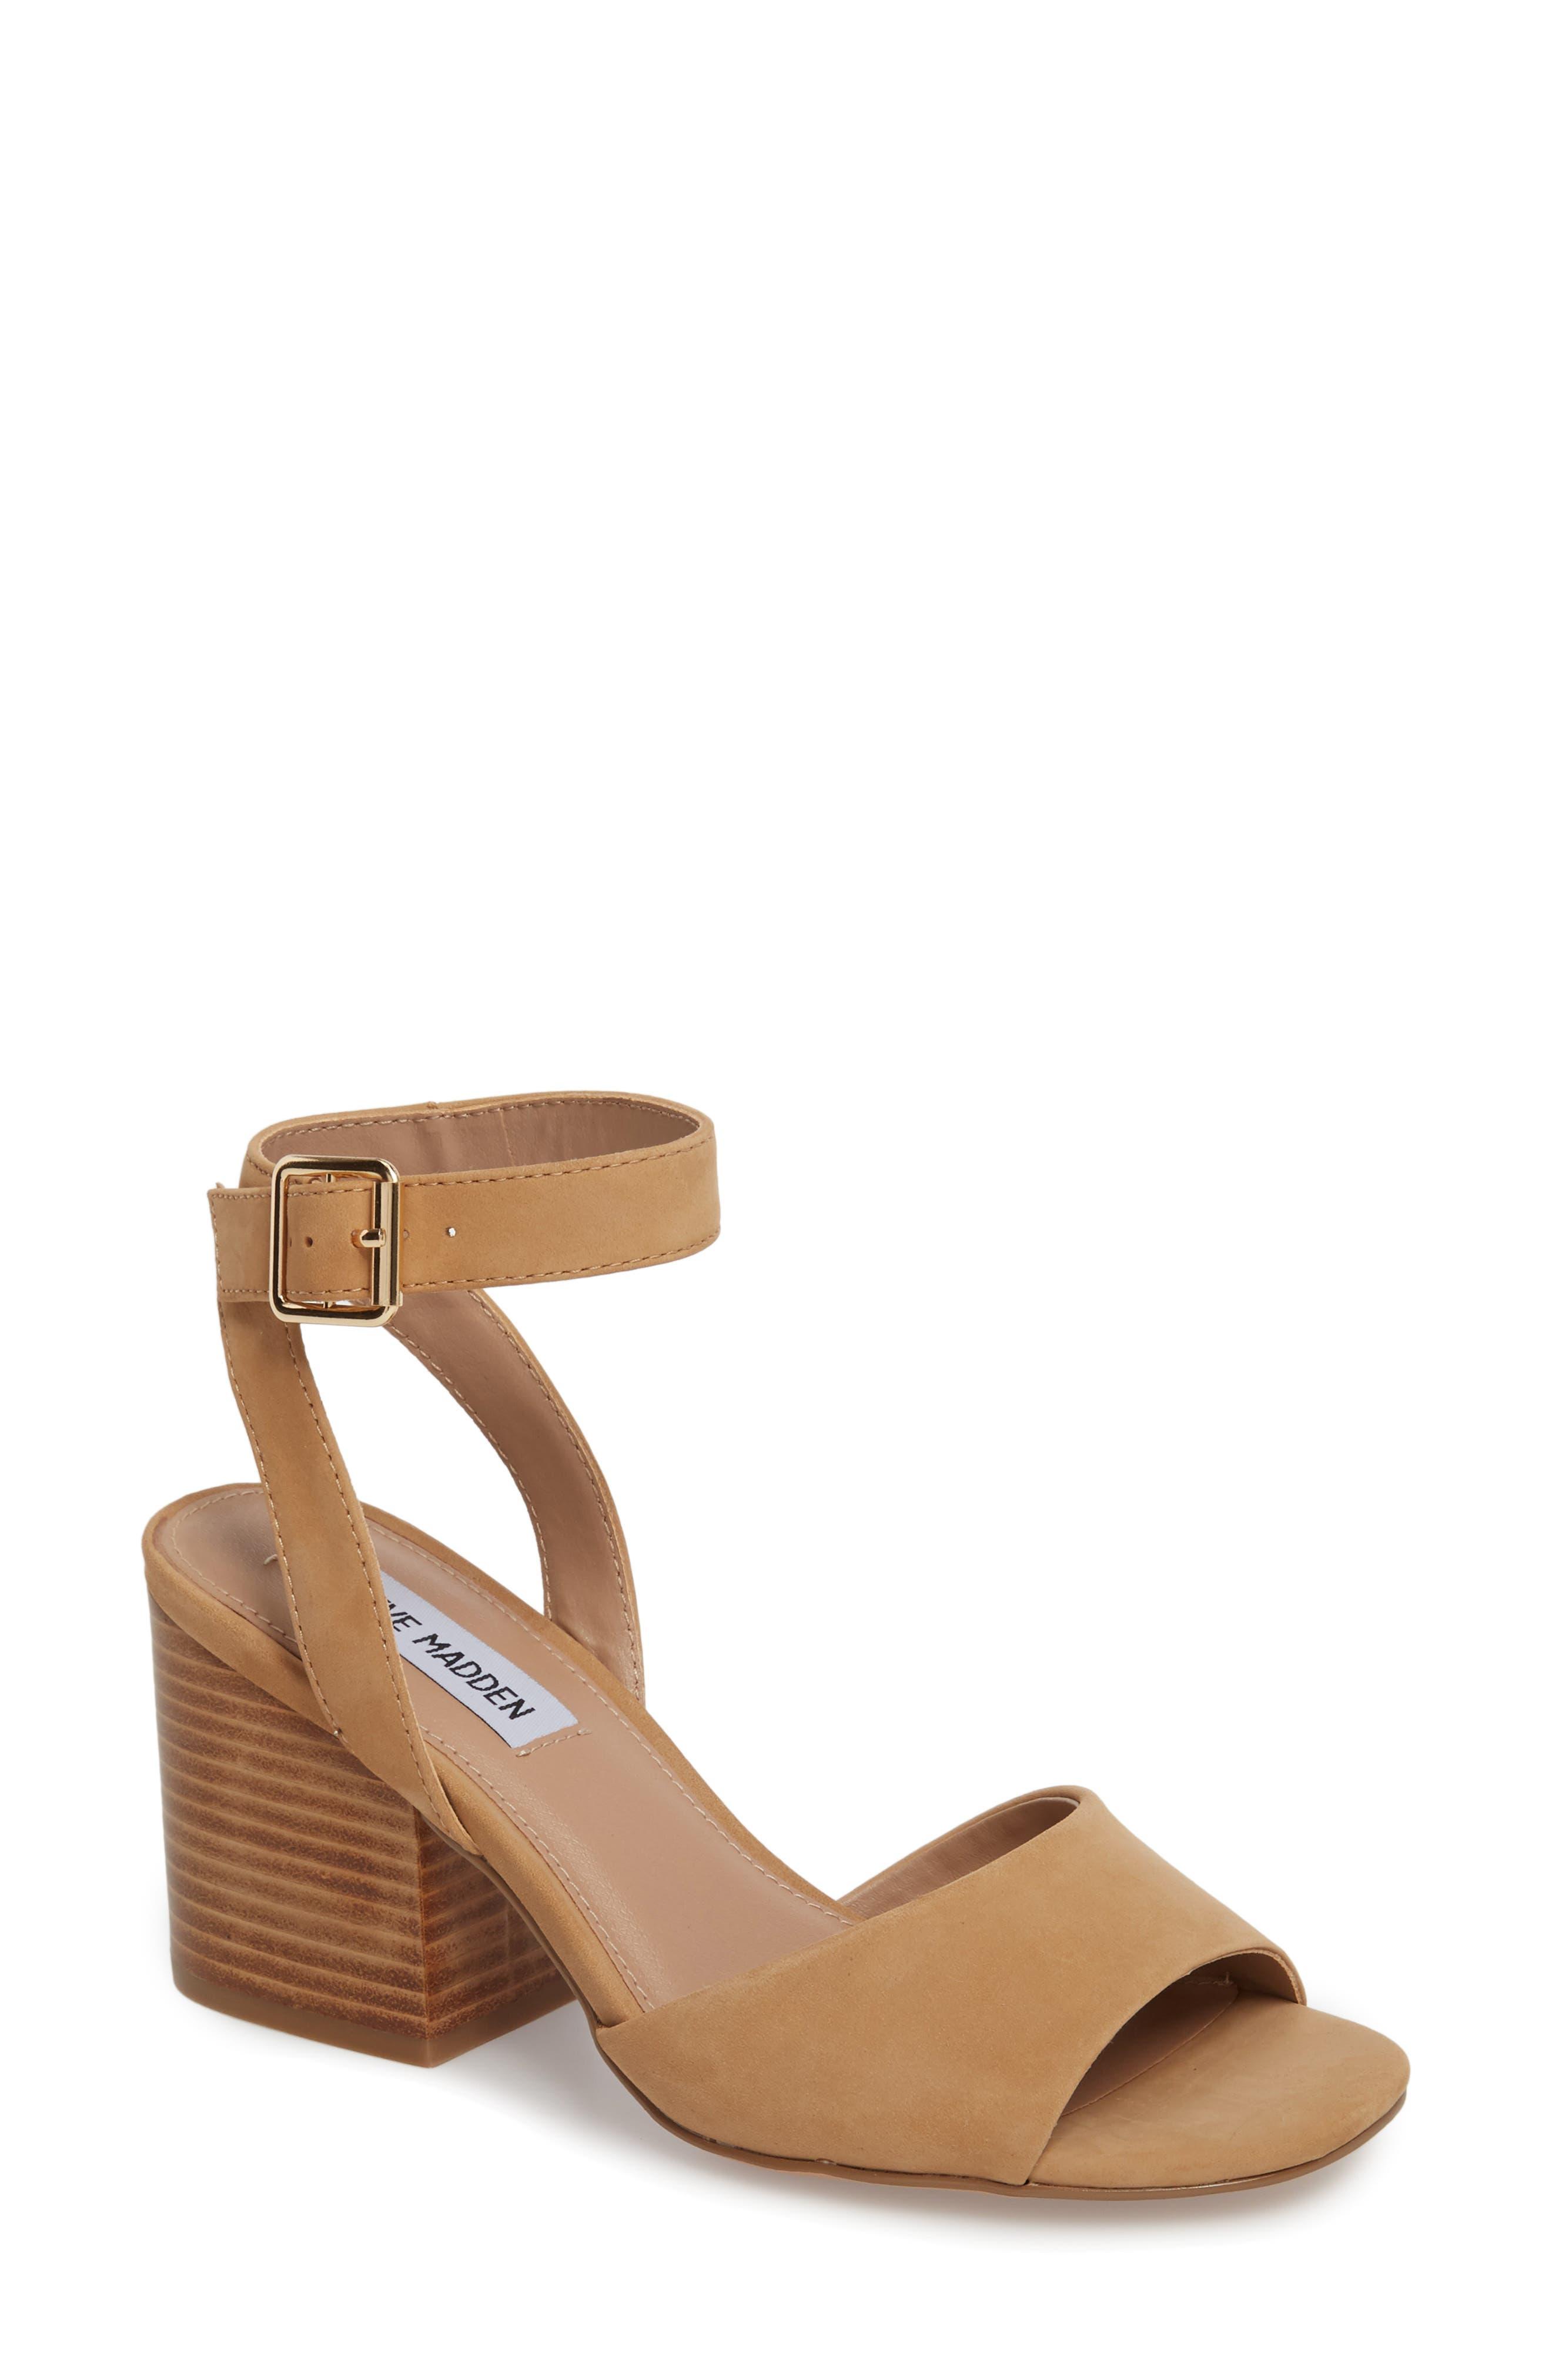 Devlin Block Heel Sandal, Main, color, 200